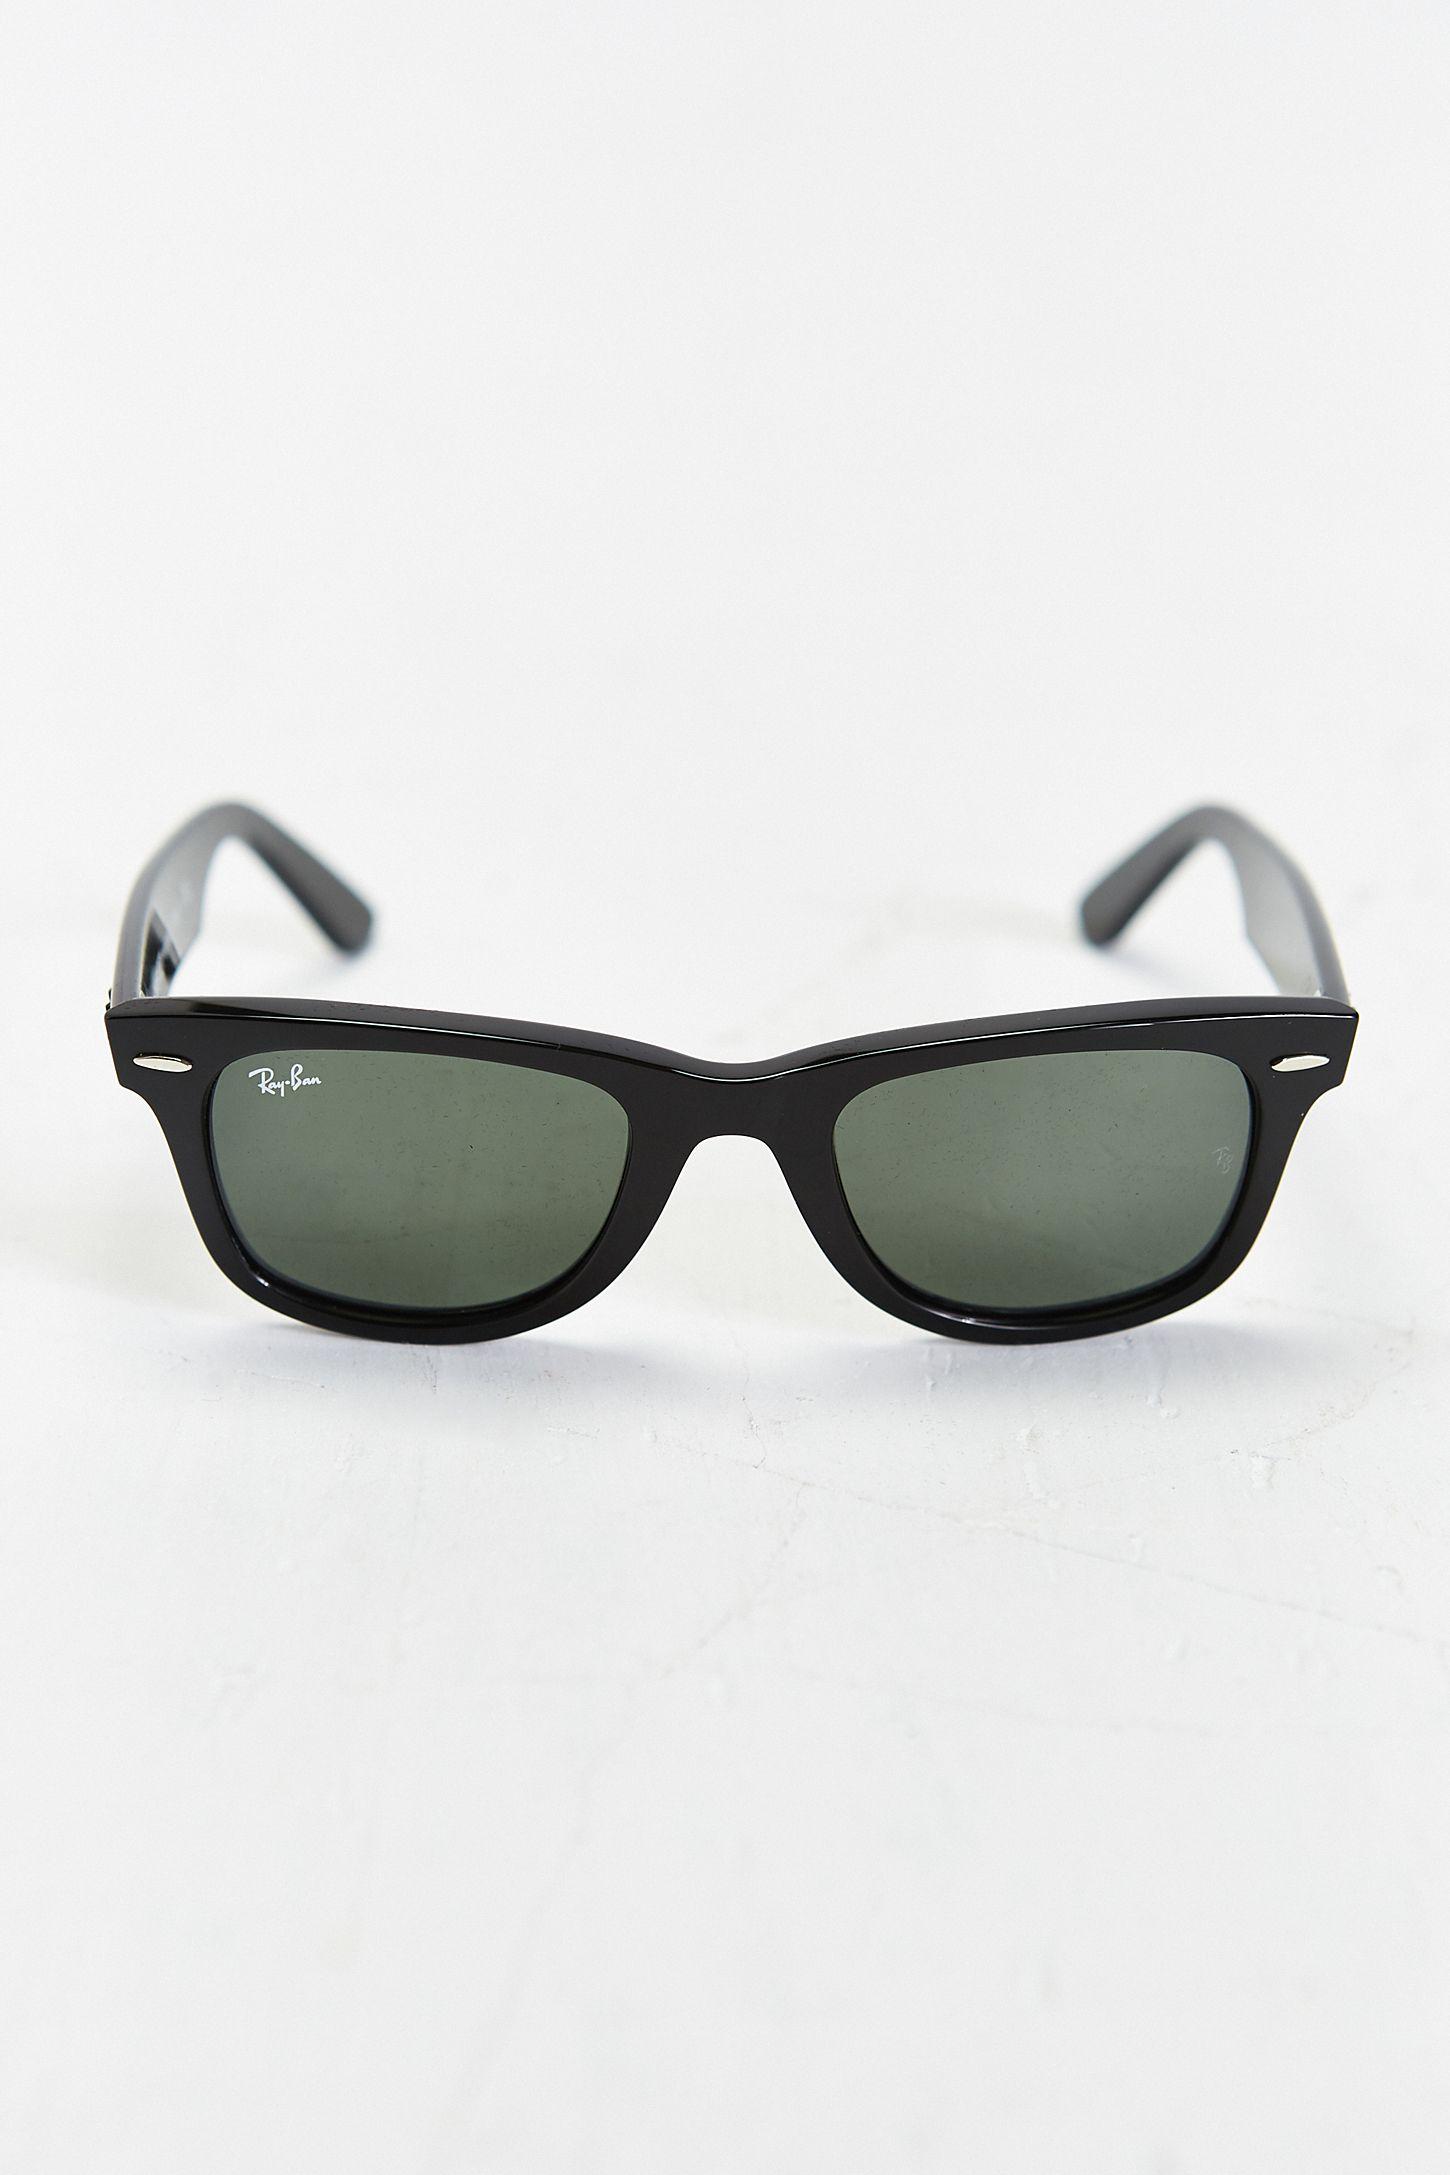 a0e45e299a7d8 Ray-Ban Classic Wayfarer Sunglasses